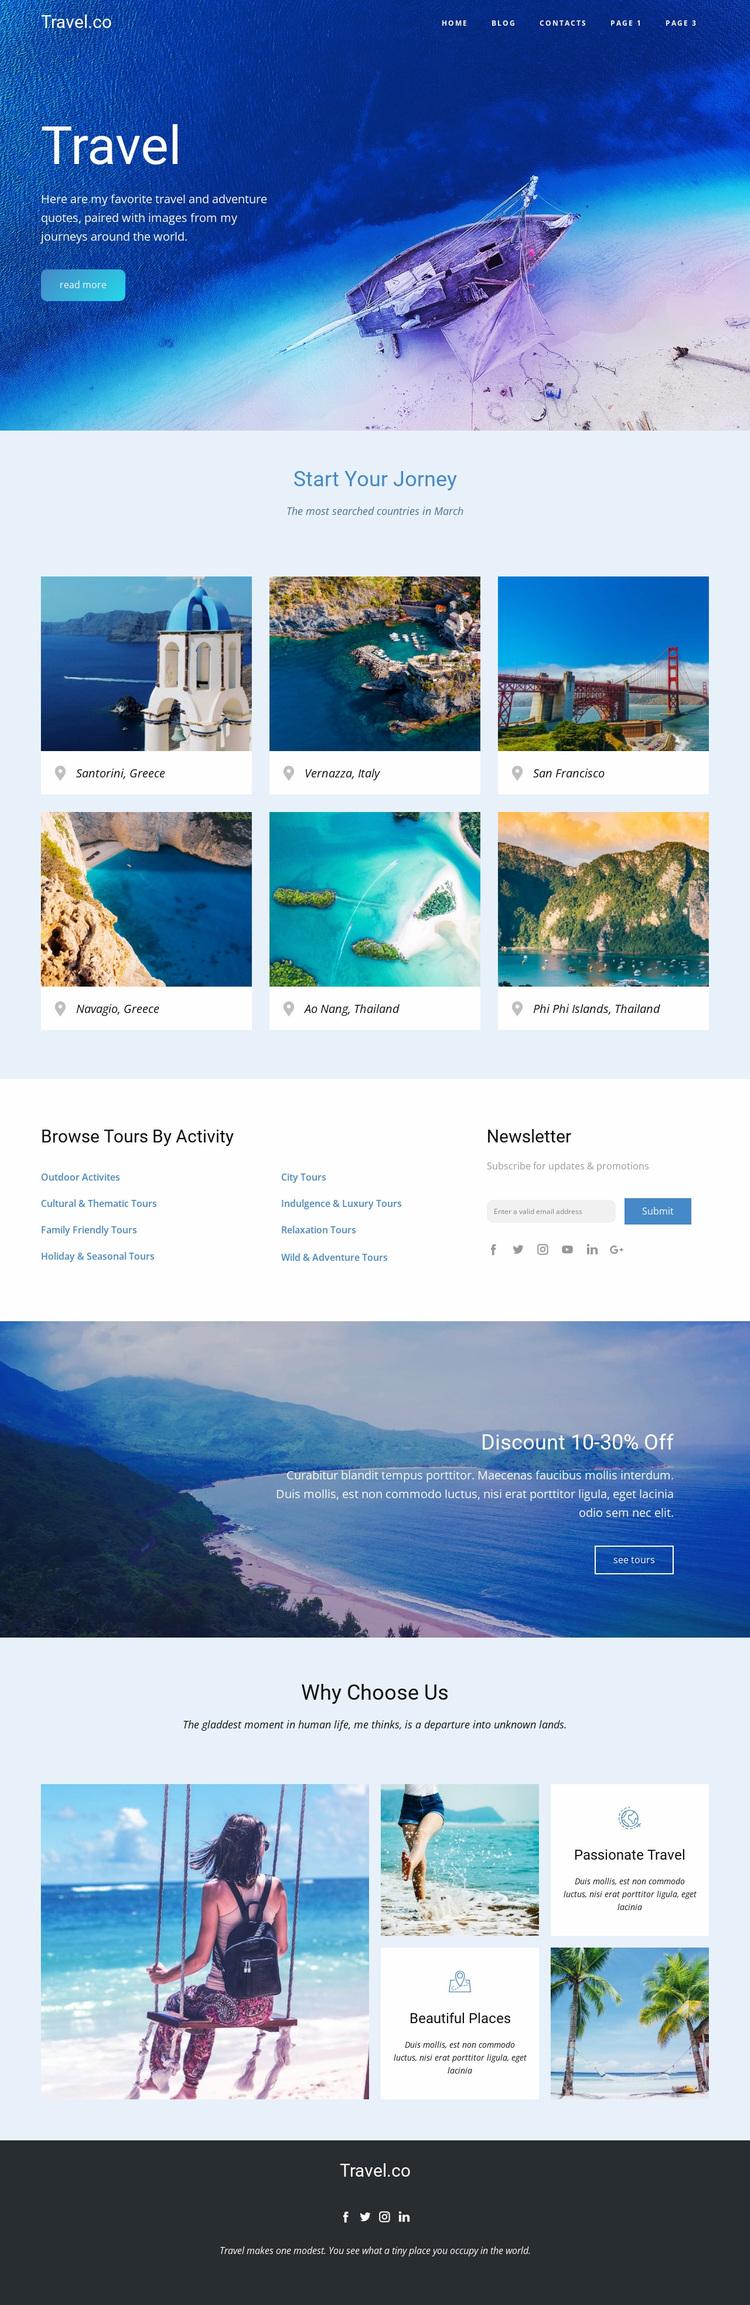 Amazing ideas for travel Website Design